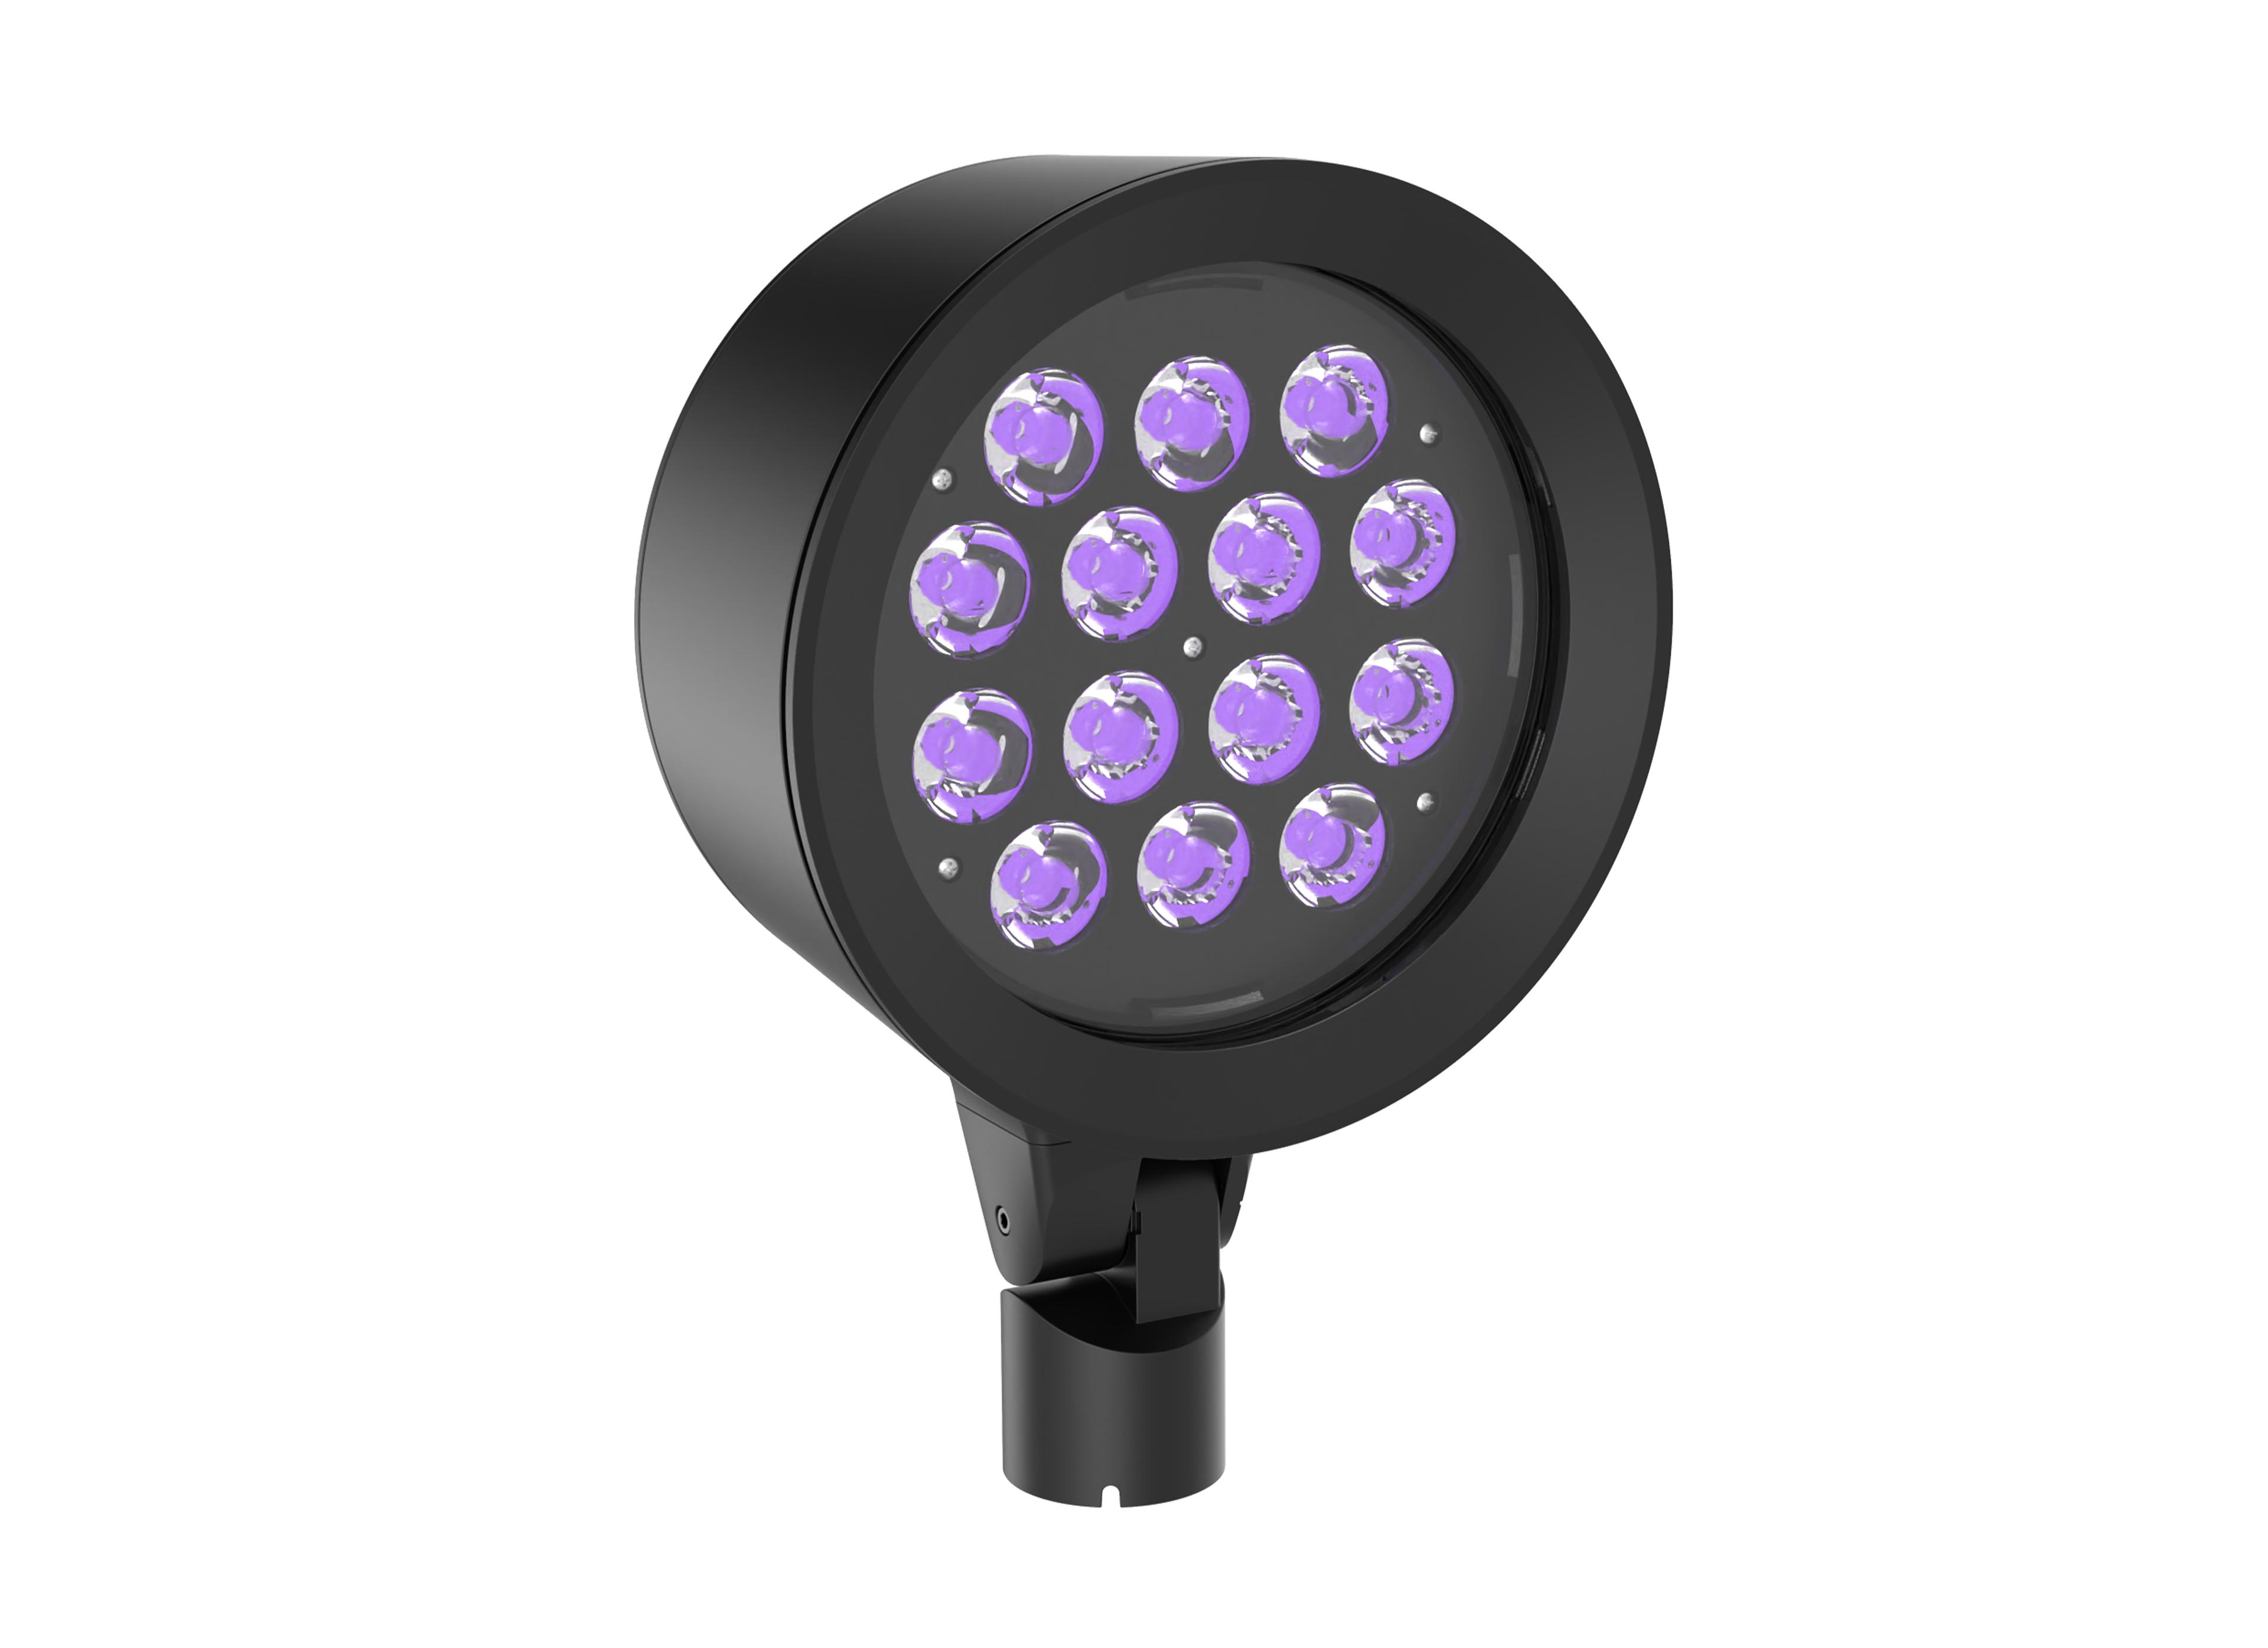 SAF14 RGBW Floodlight